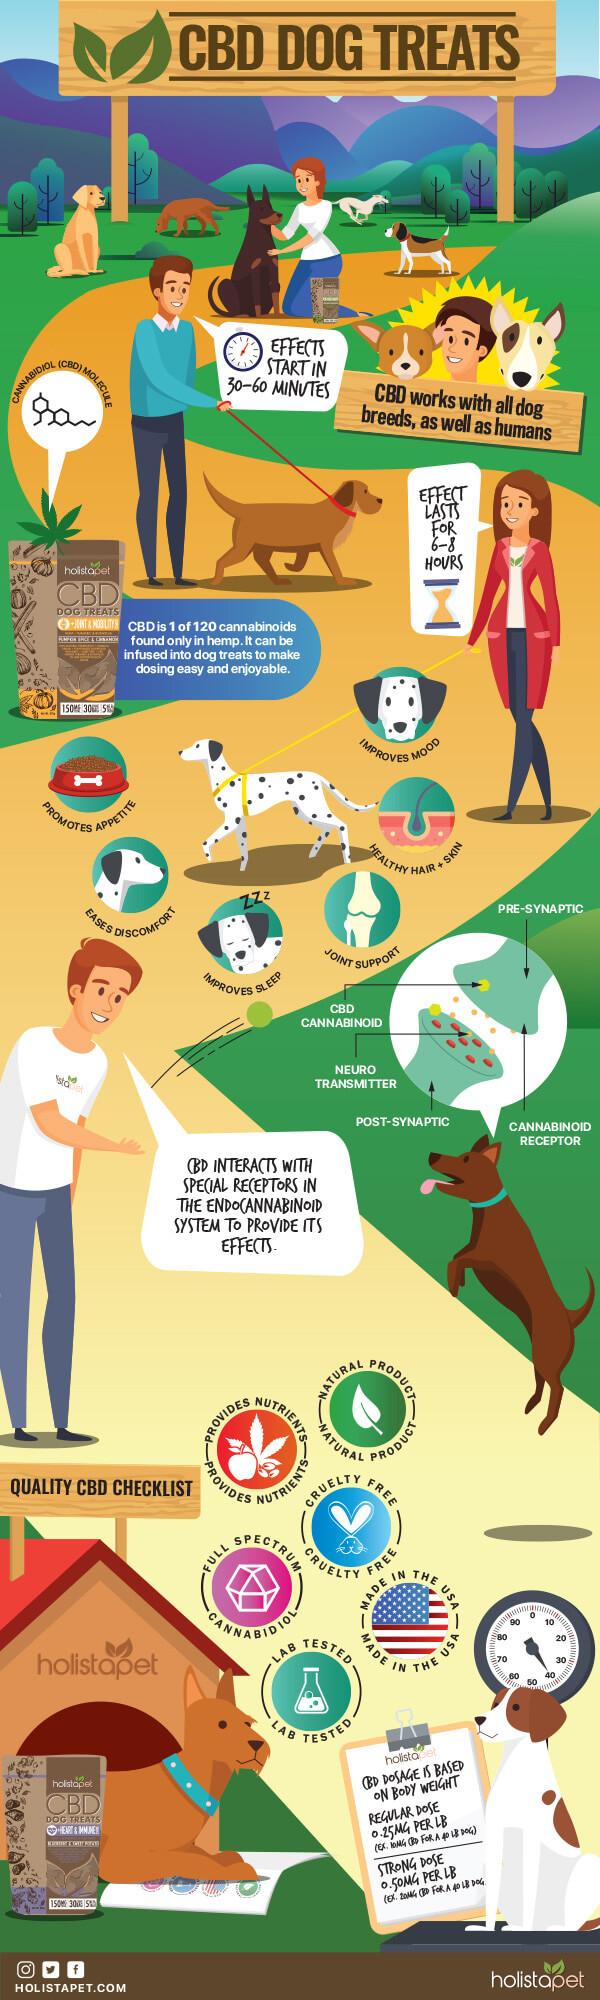 CBD-Dog-Treats-Infographic-plaza